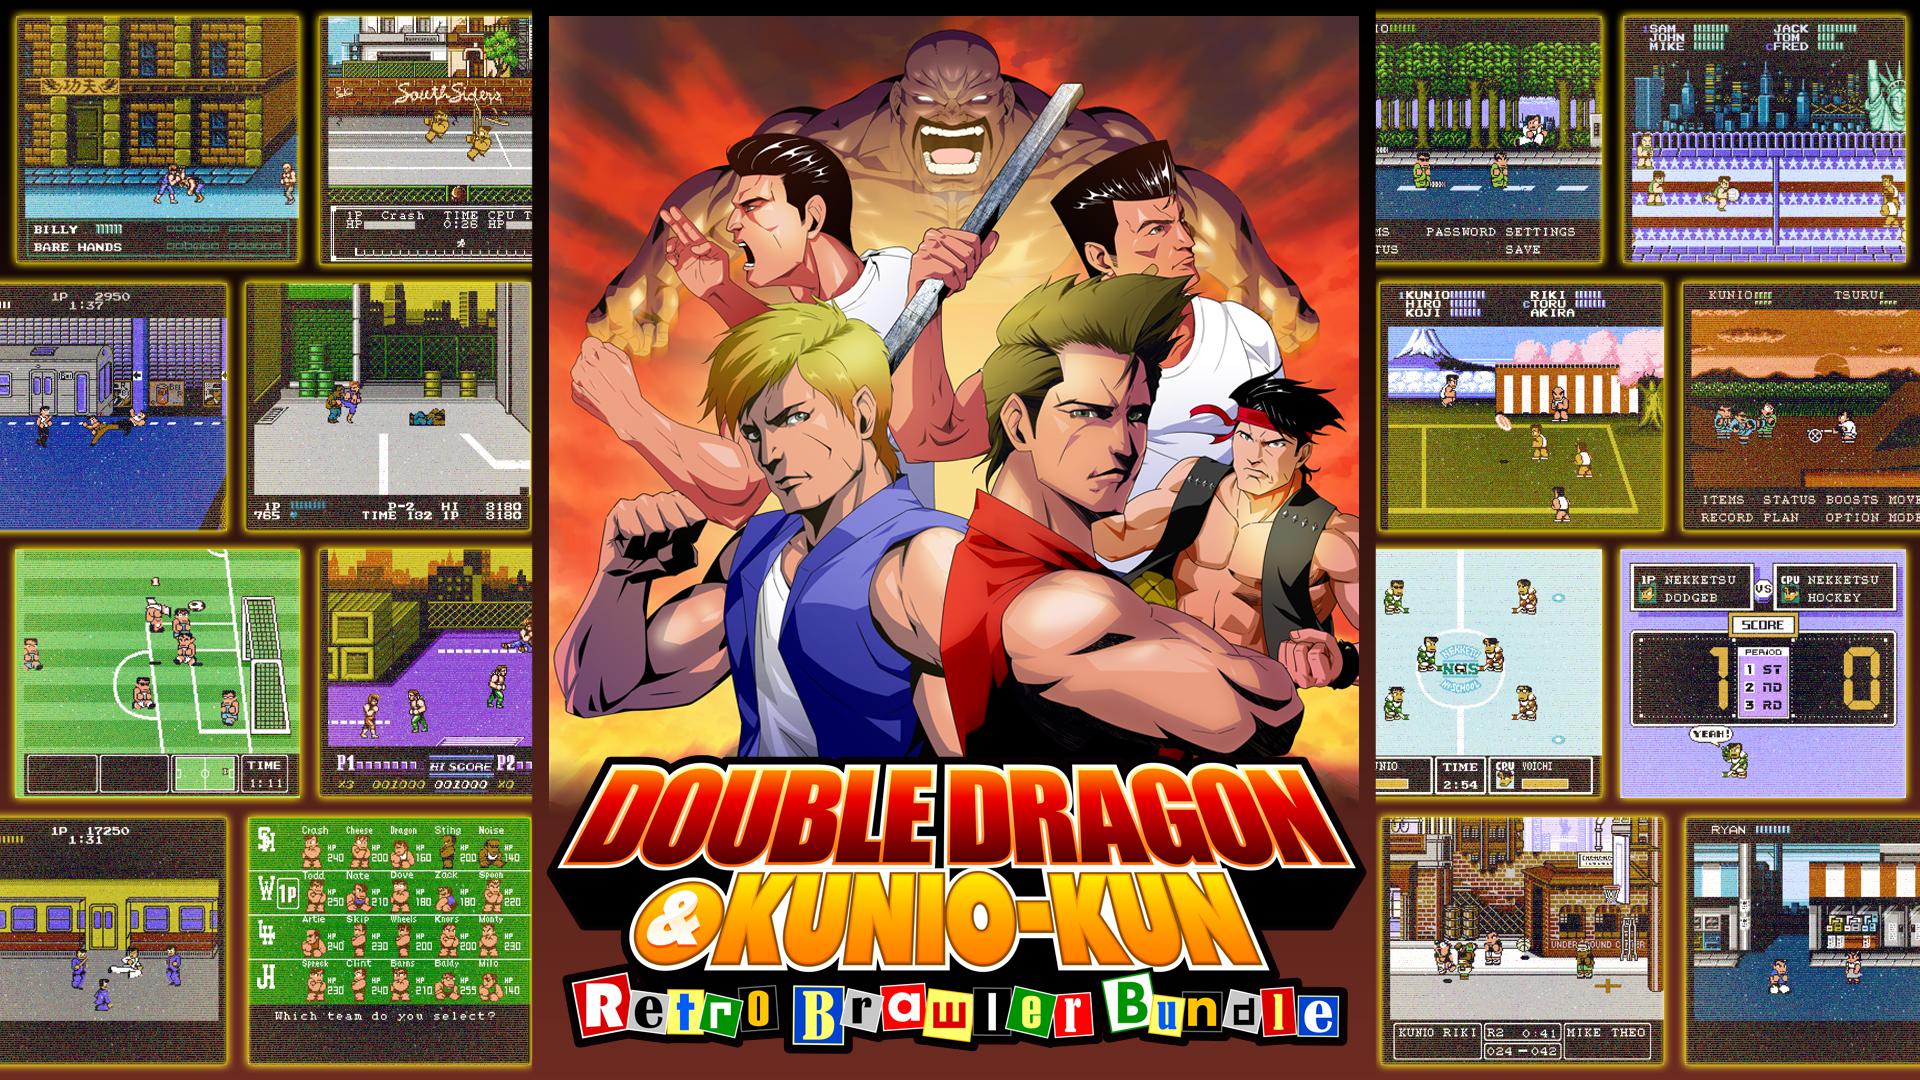 [Nintendo Switch] Double Dragon & Kunio-kun: Retro Brawler Bundle (18 Games) - £14.26 @ Nintendo eShop US